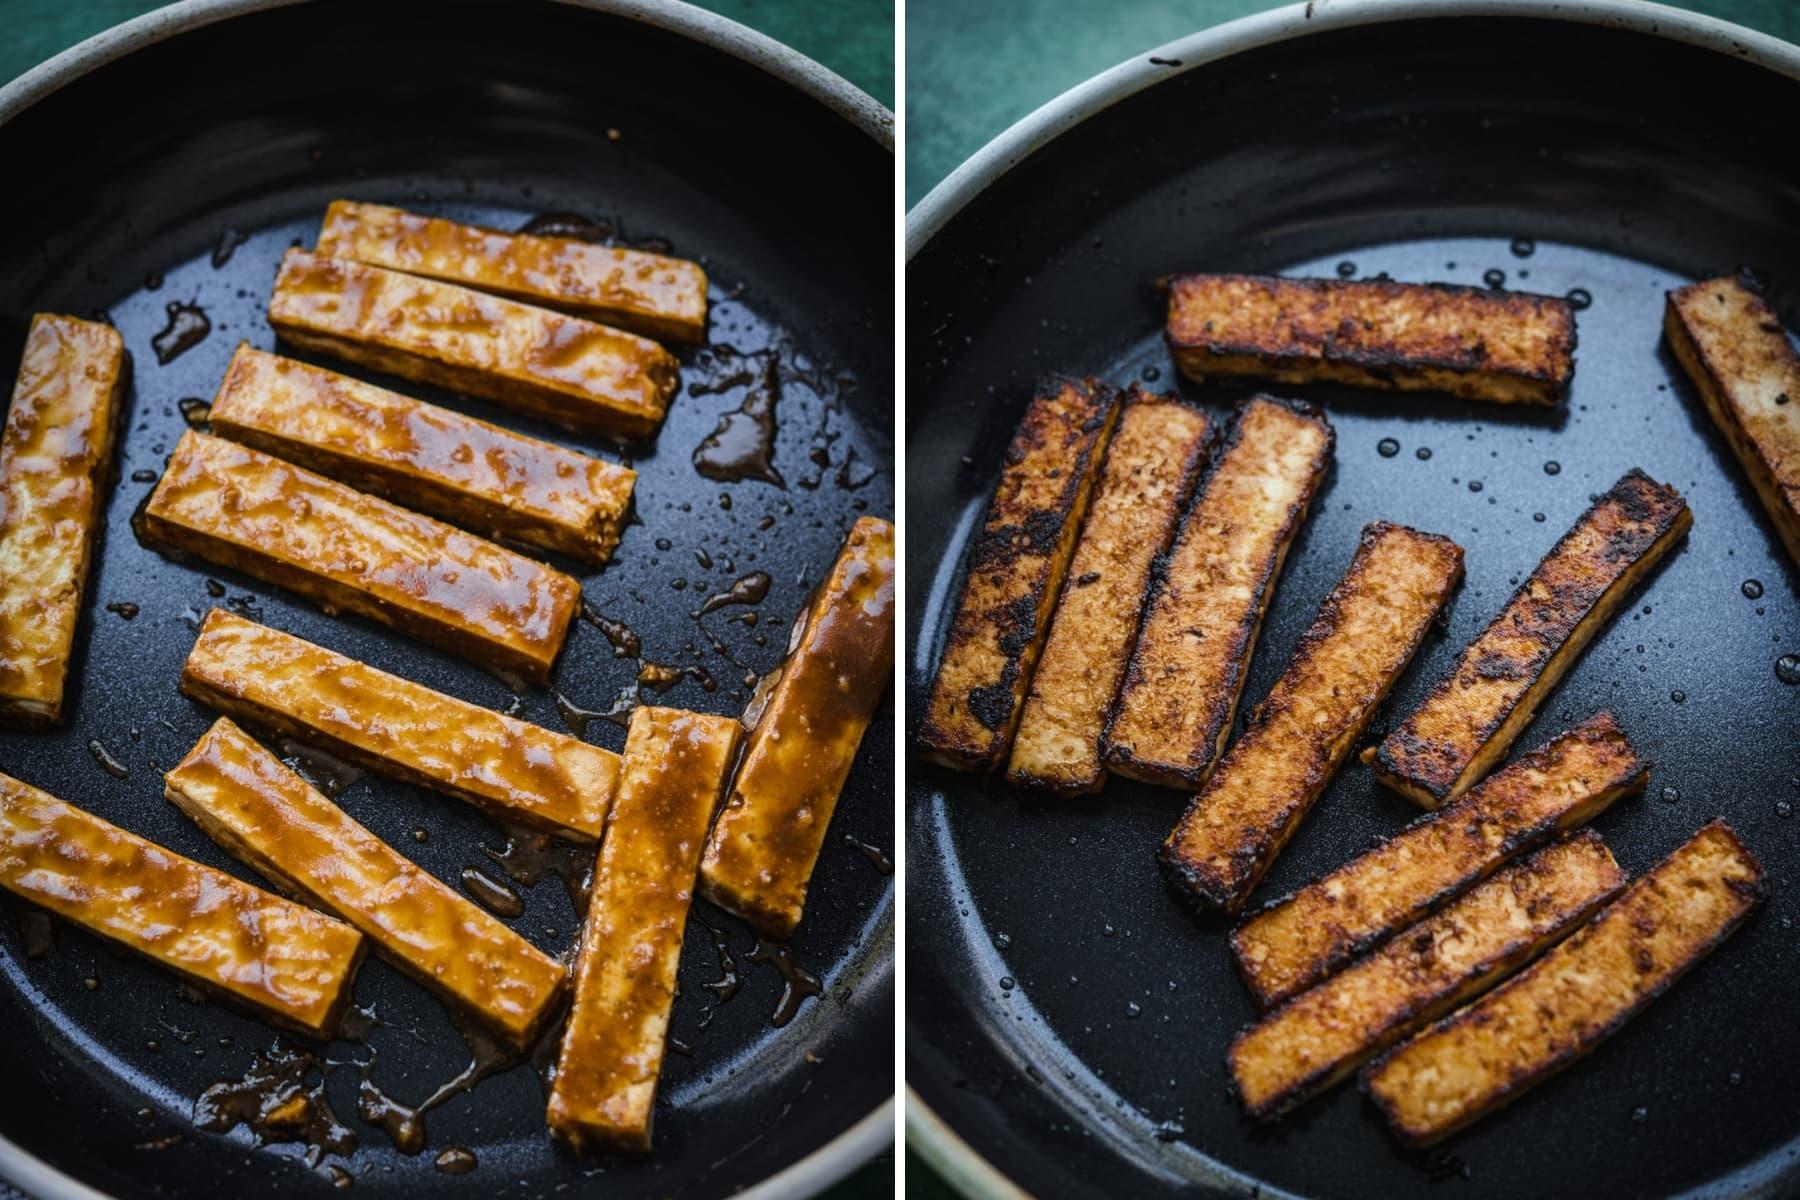 miso glazed tofu in a nonstick skillet.